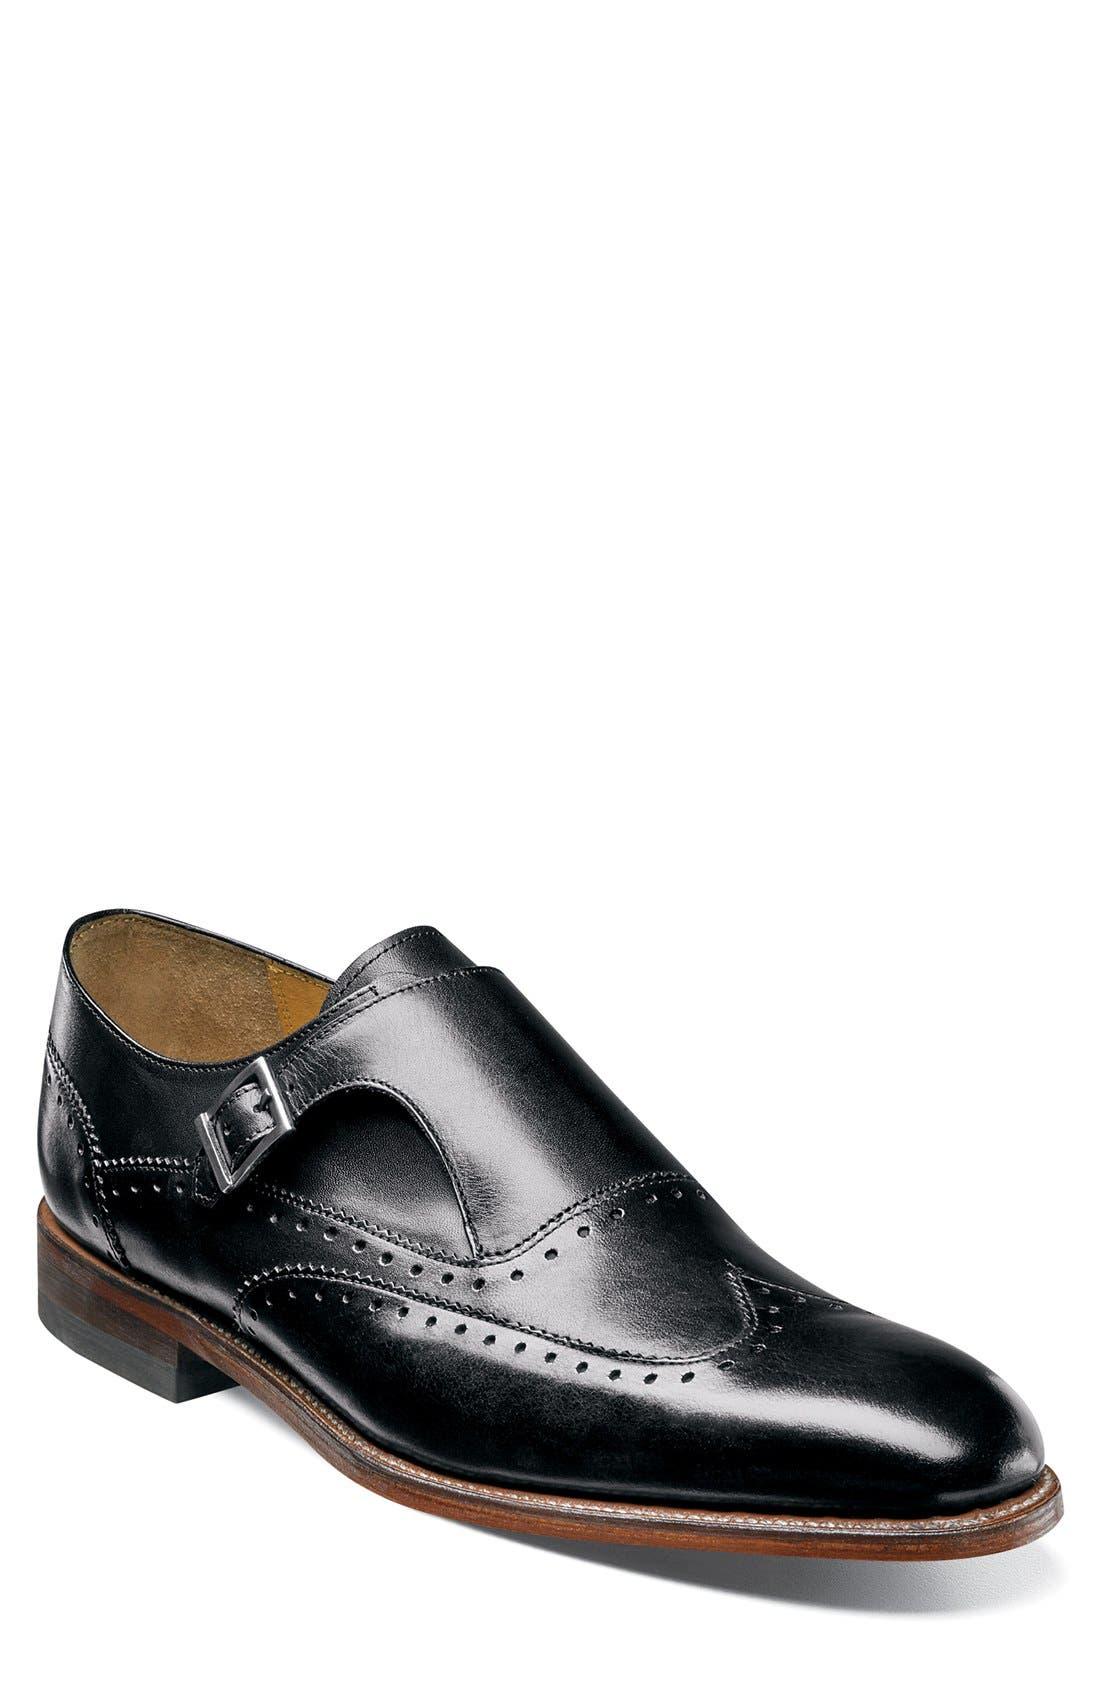 Madison II Monk Strap Shoe,                         Main,                         color, Black